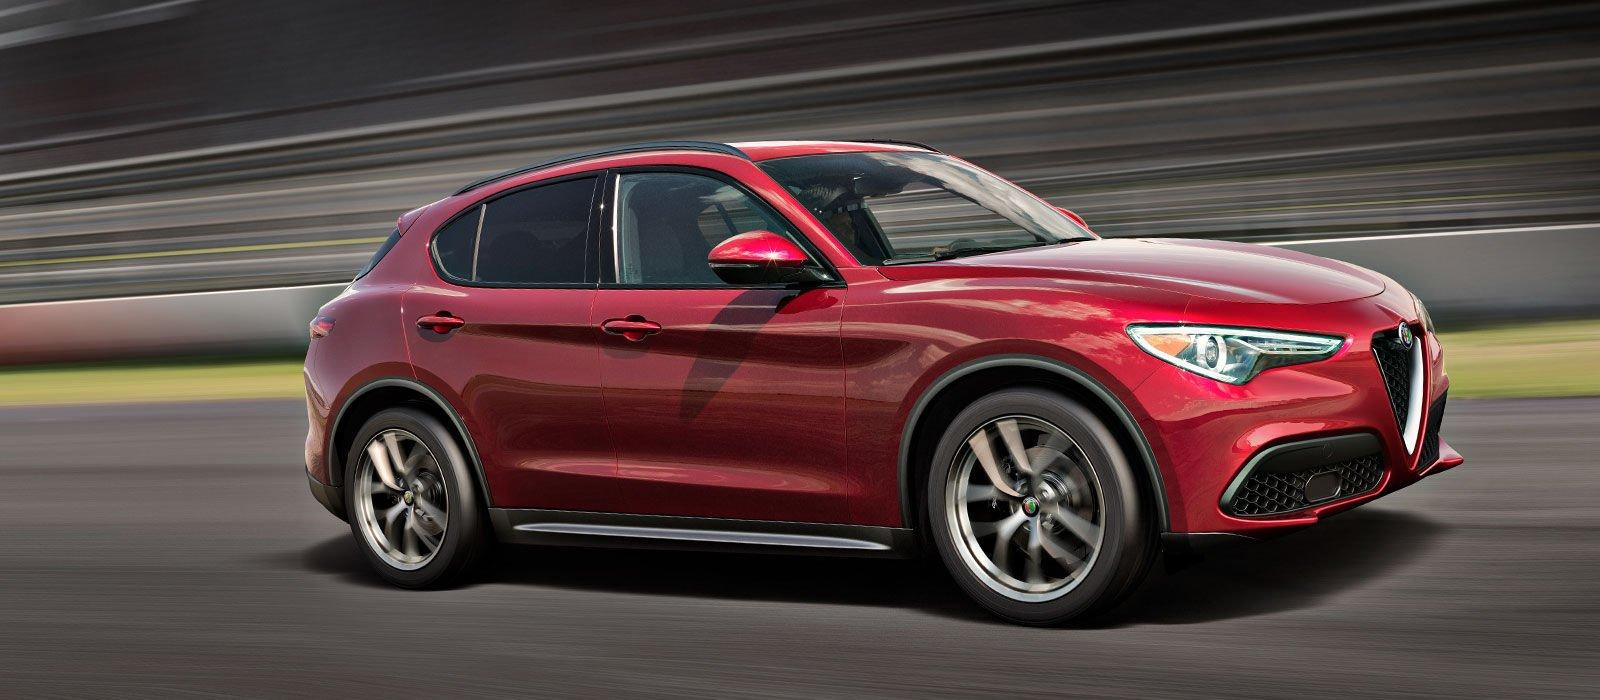 New Alfa Romeo Stelvio Price Lease Offers Austin Tx Msrp Exterior Info